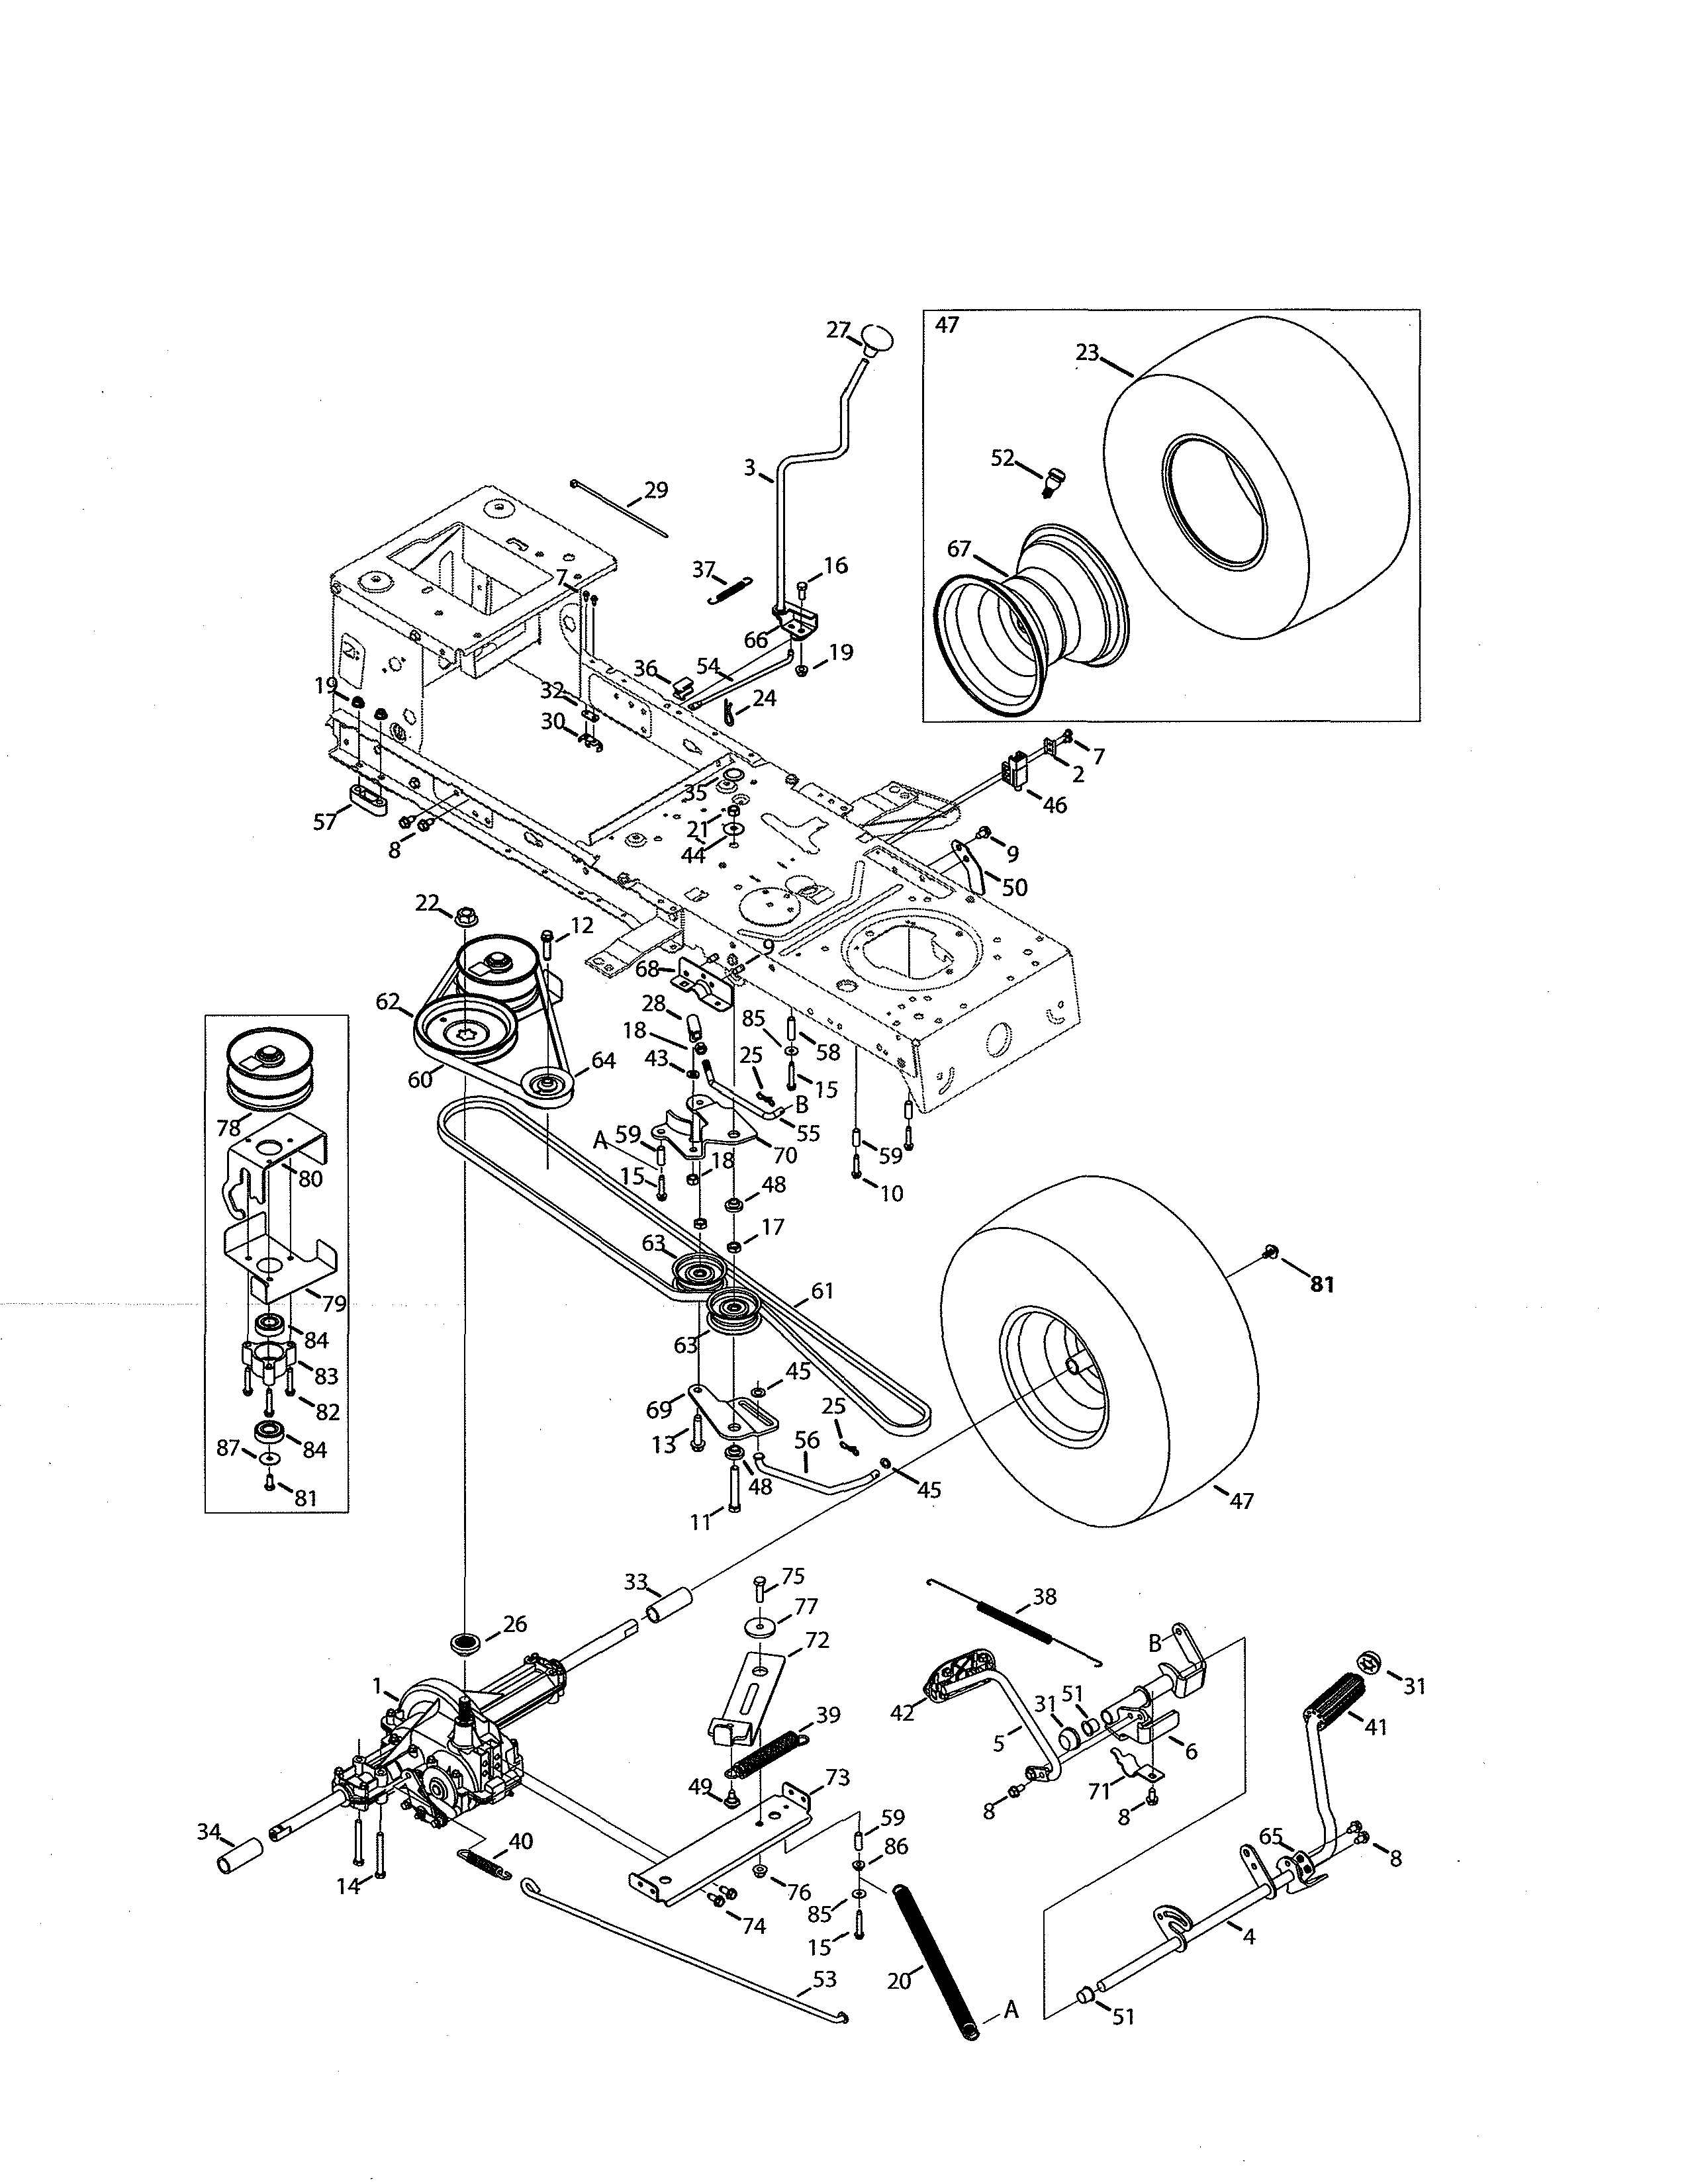 Craftsman 247273430 Transmission Diagram Lawn Tractor Craftsman Riding Lawn Mower Tractors